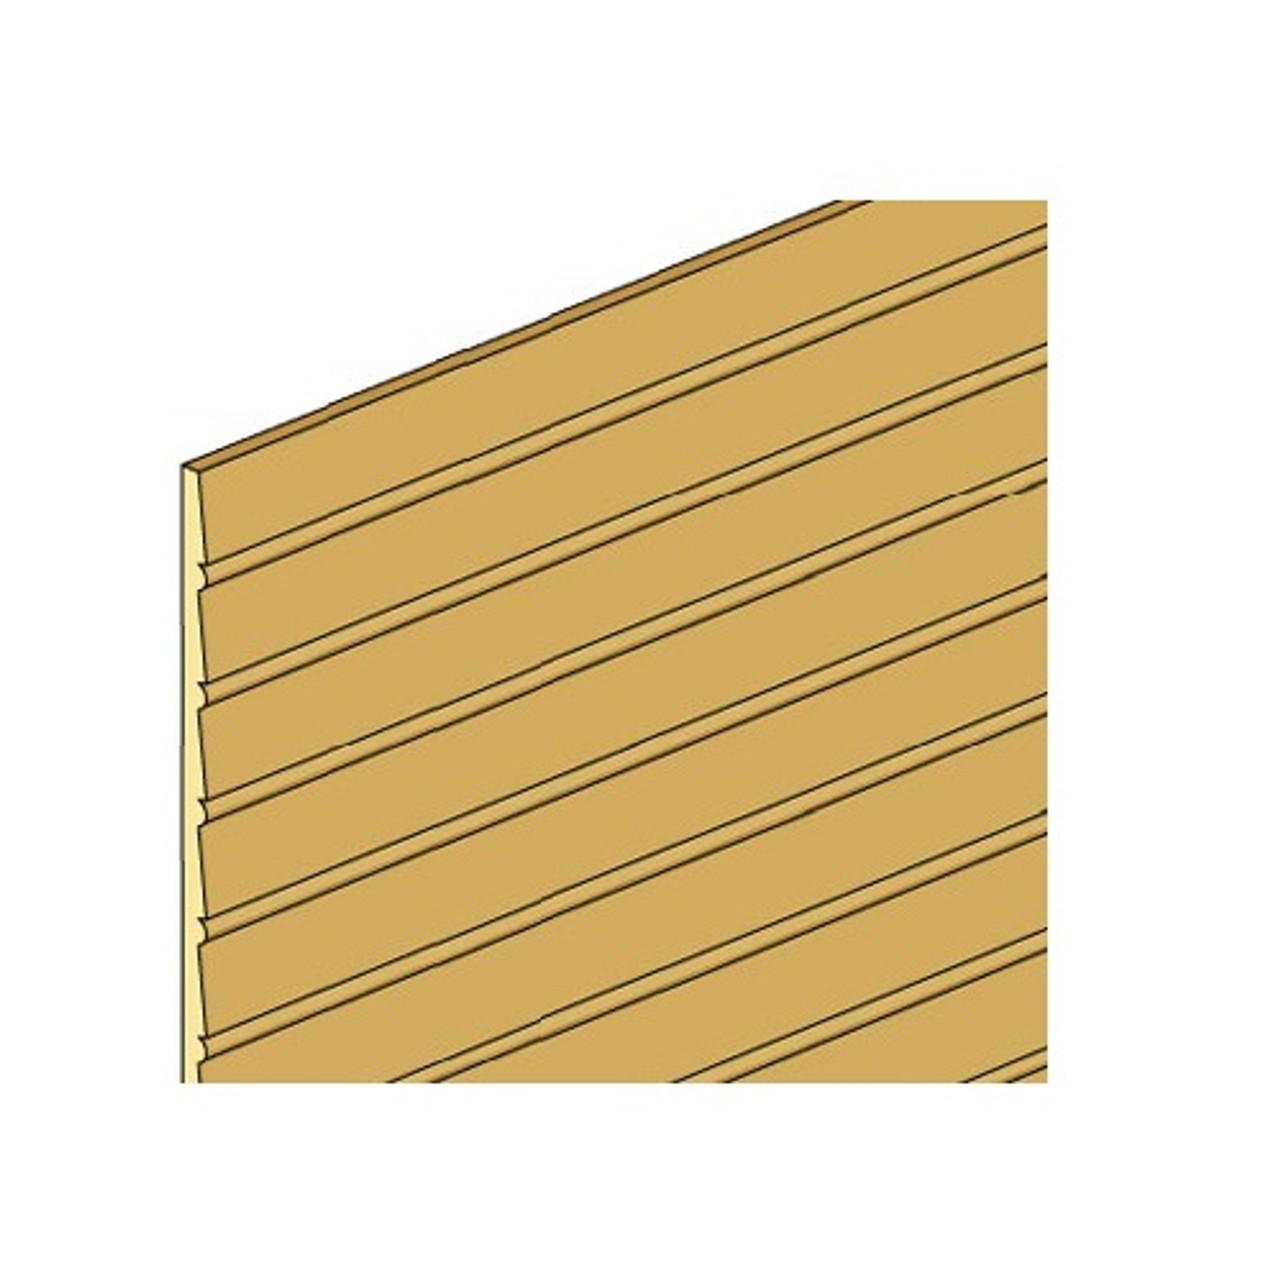 Illustration of NE387 beaded clapboard sheet